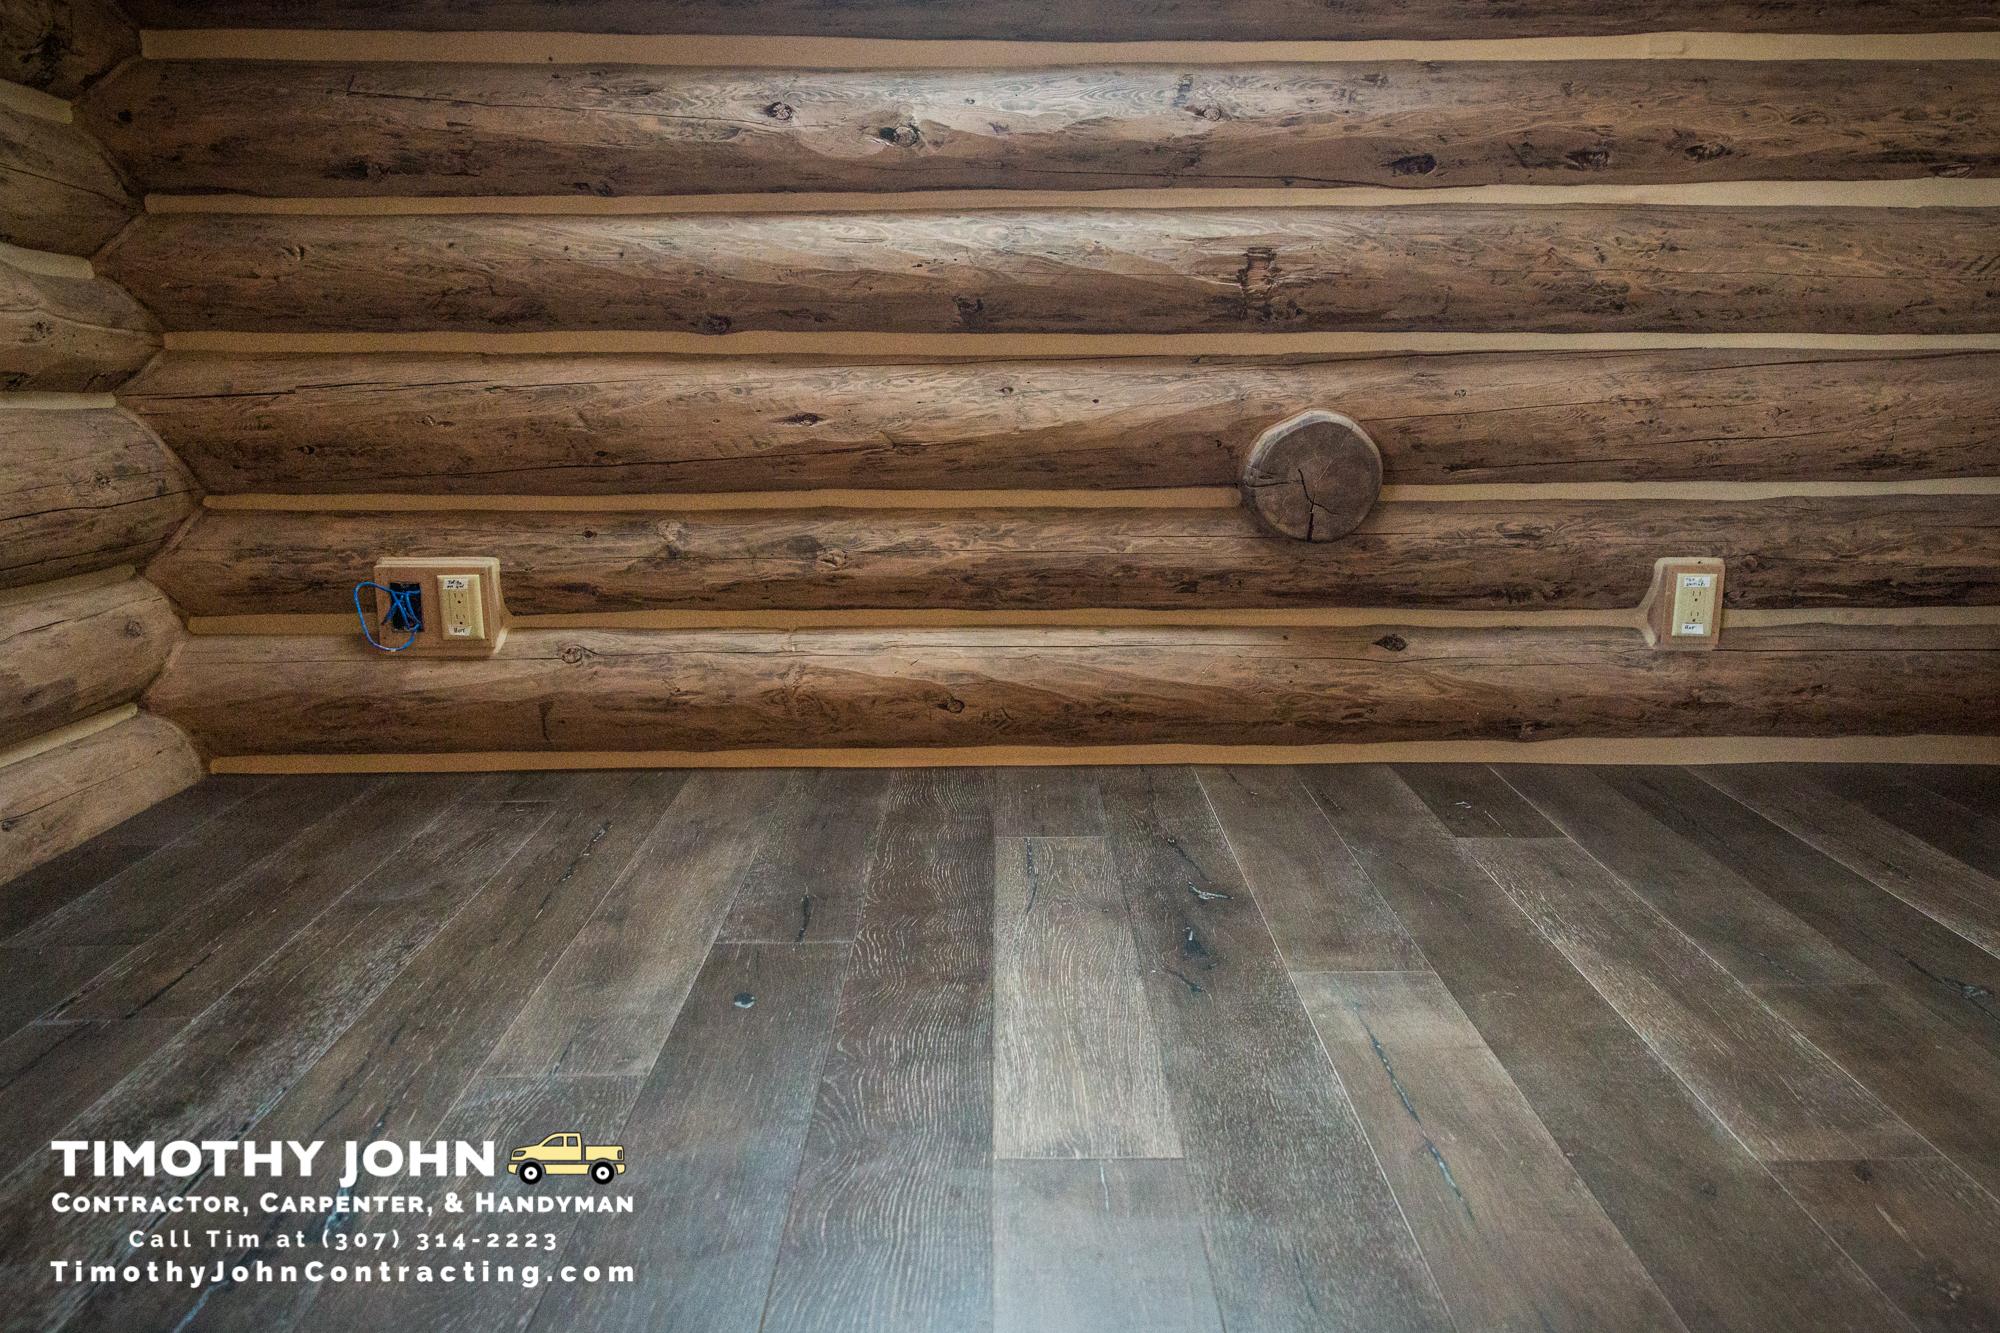 Timothy-John-Contractor-Flooring-Tile-Laramie-Wyoming-10.jpg